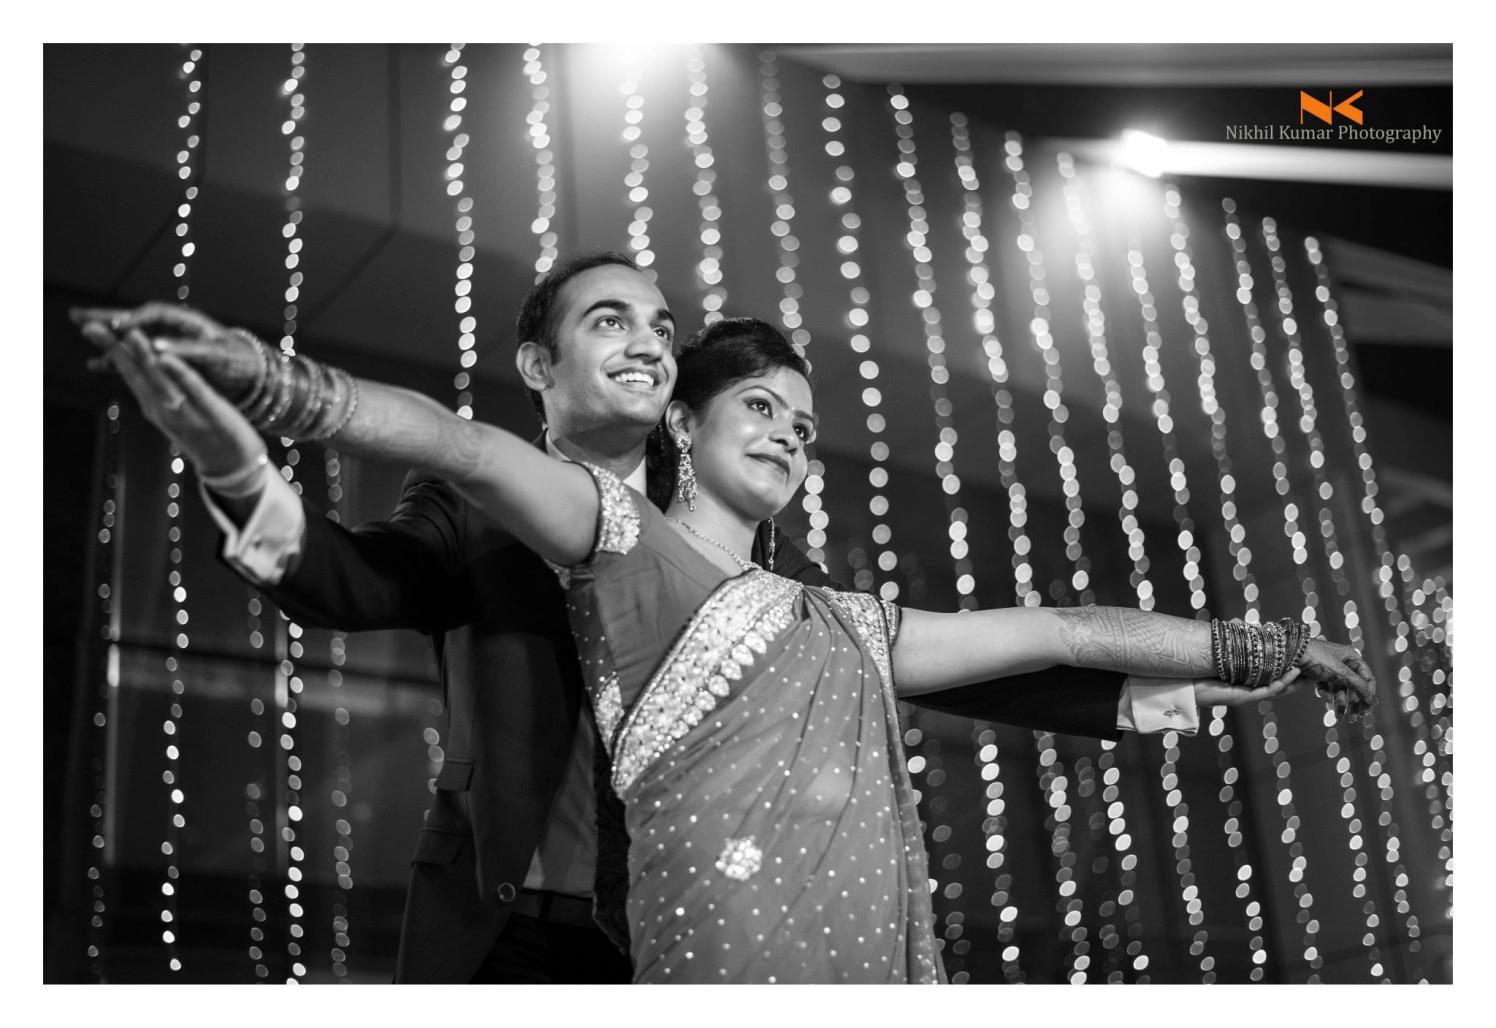 Titanic Themed Photoshoot by Nikhil Kumar Wedding-photography | Weddings Photos & Ideas